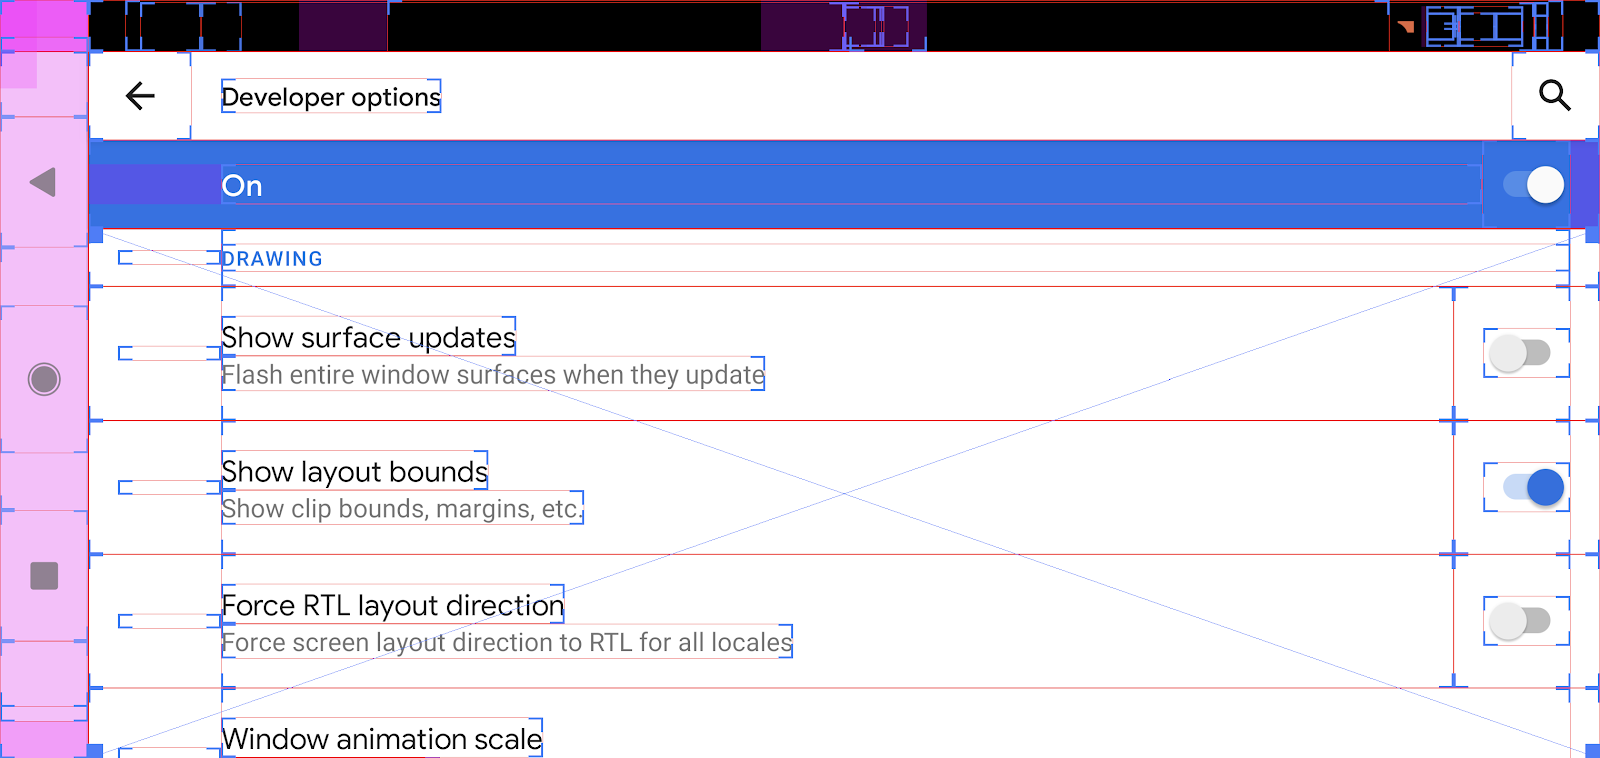 Screenshot showing layout bounds on screen.